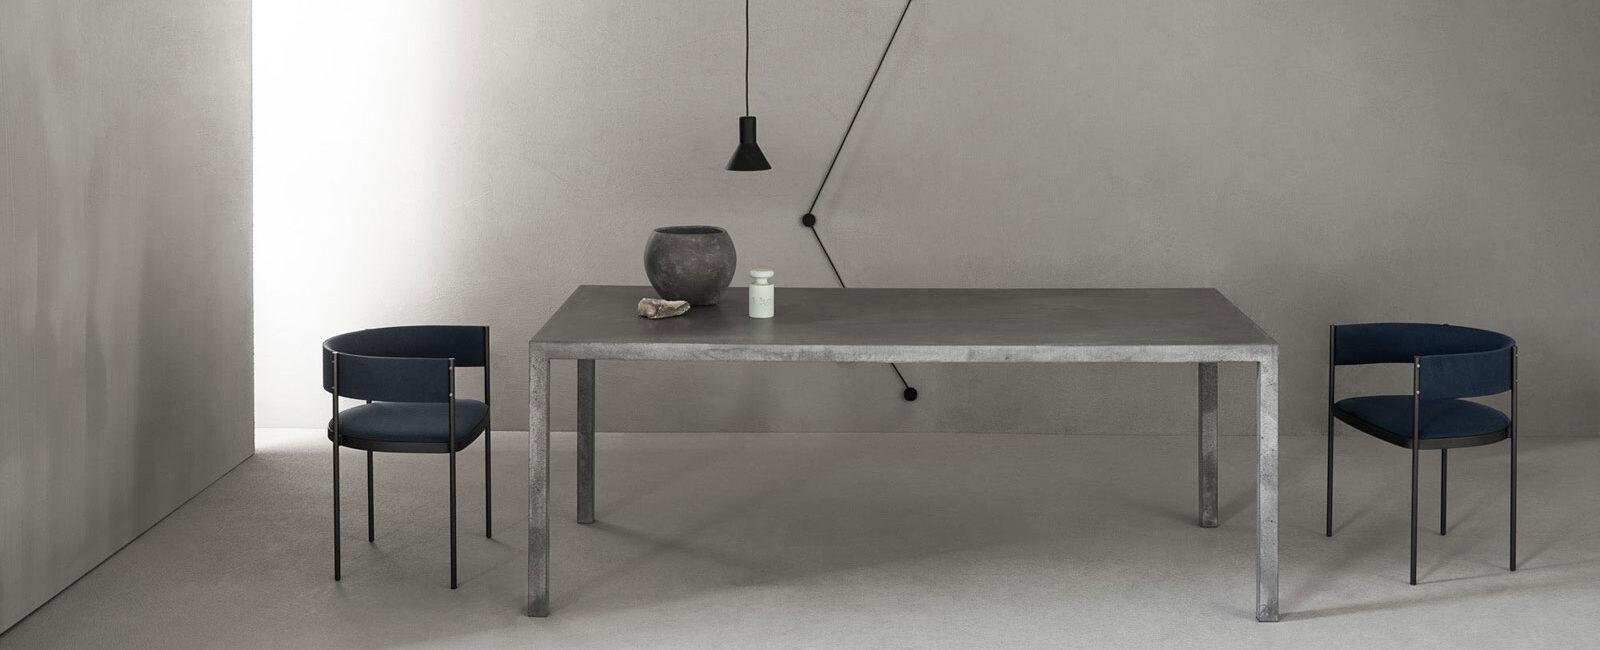 Trend 2021: concrete furnishings